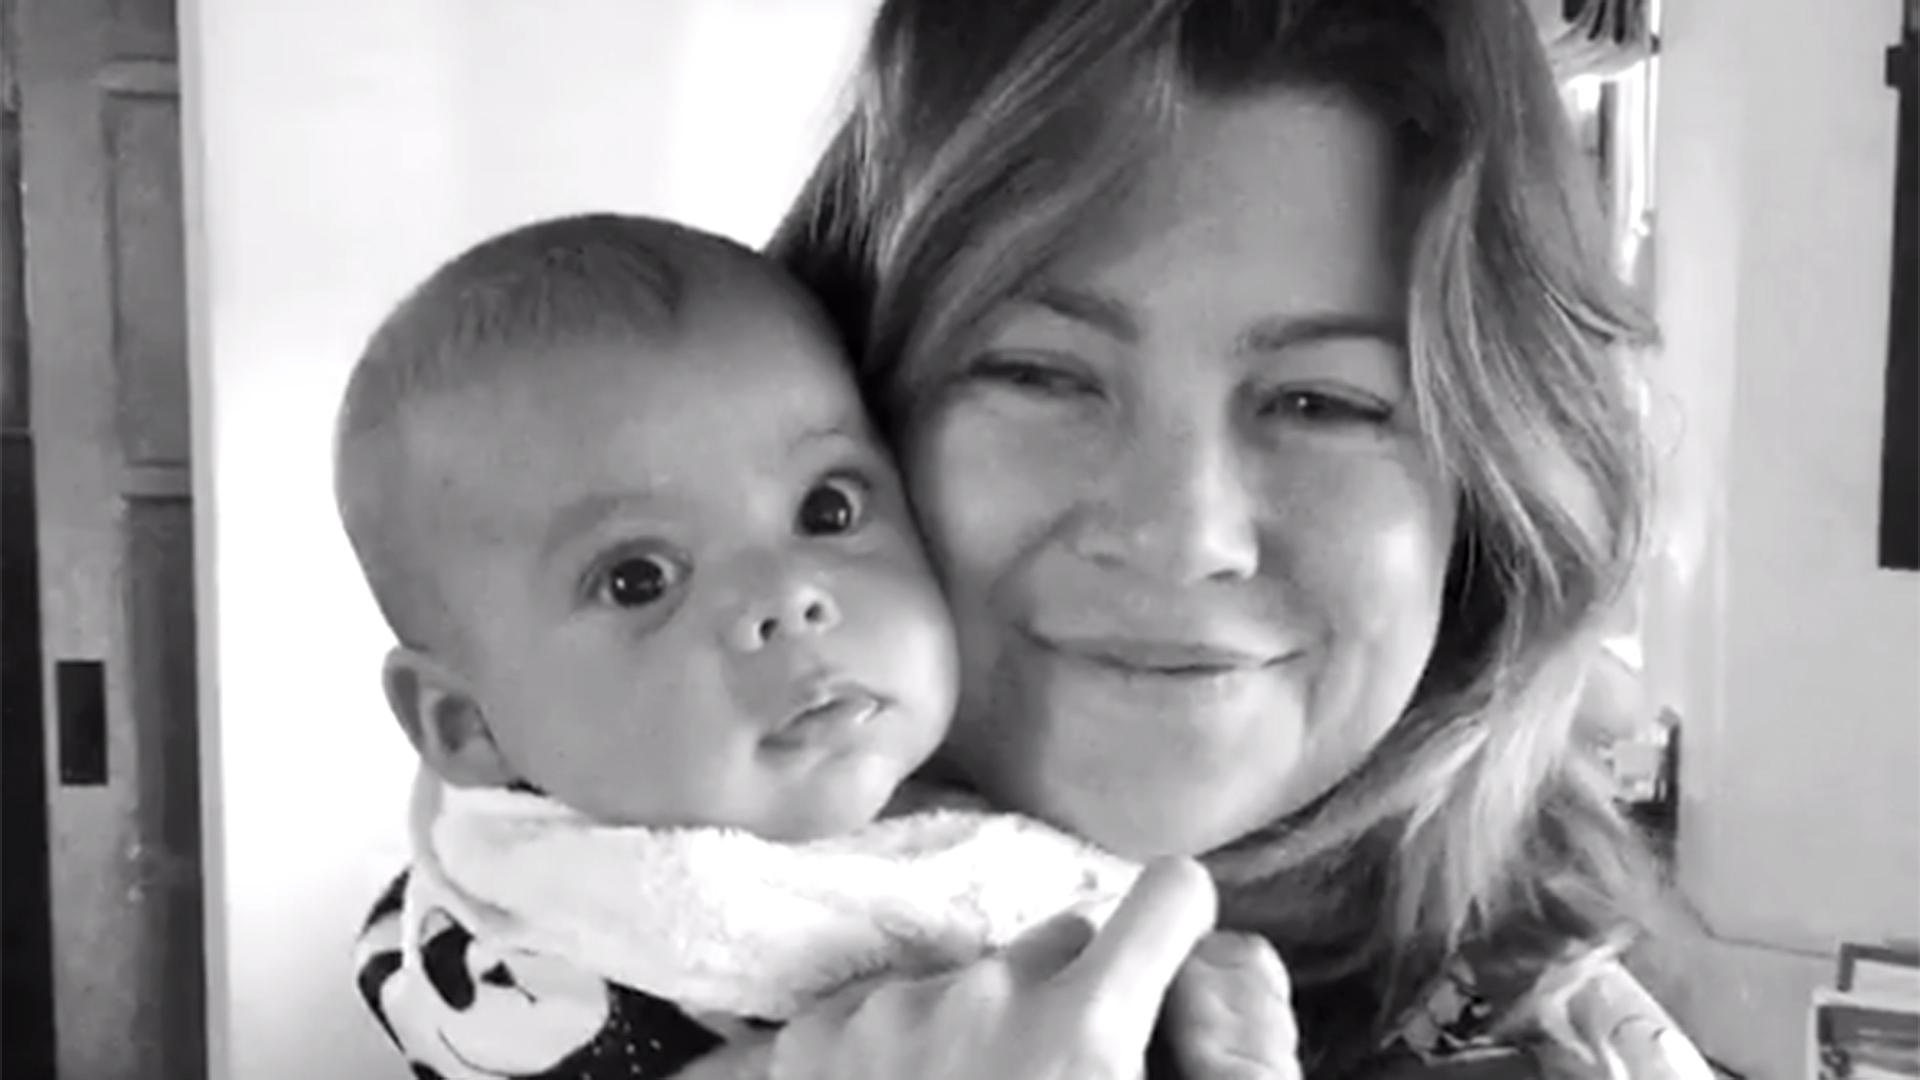 Ellen pompeo date of birth in Australia